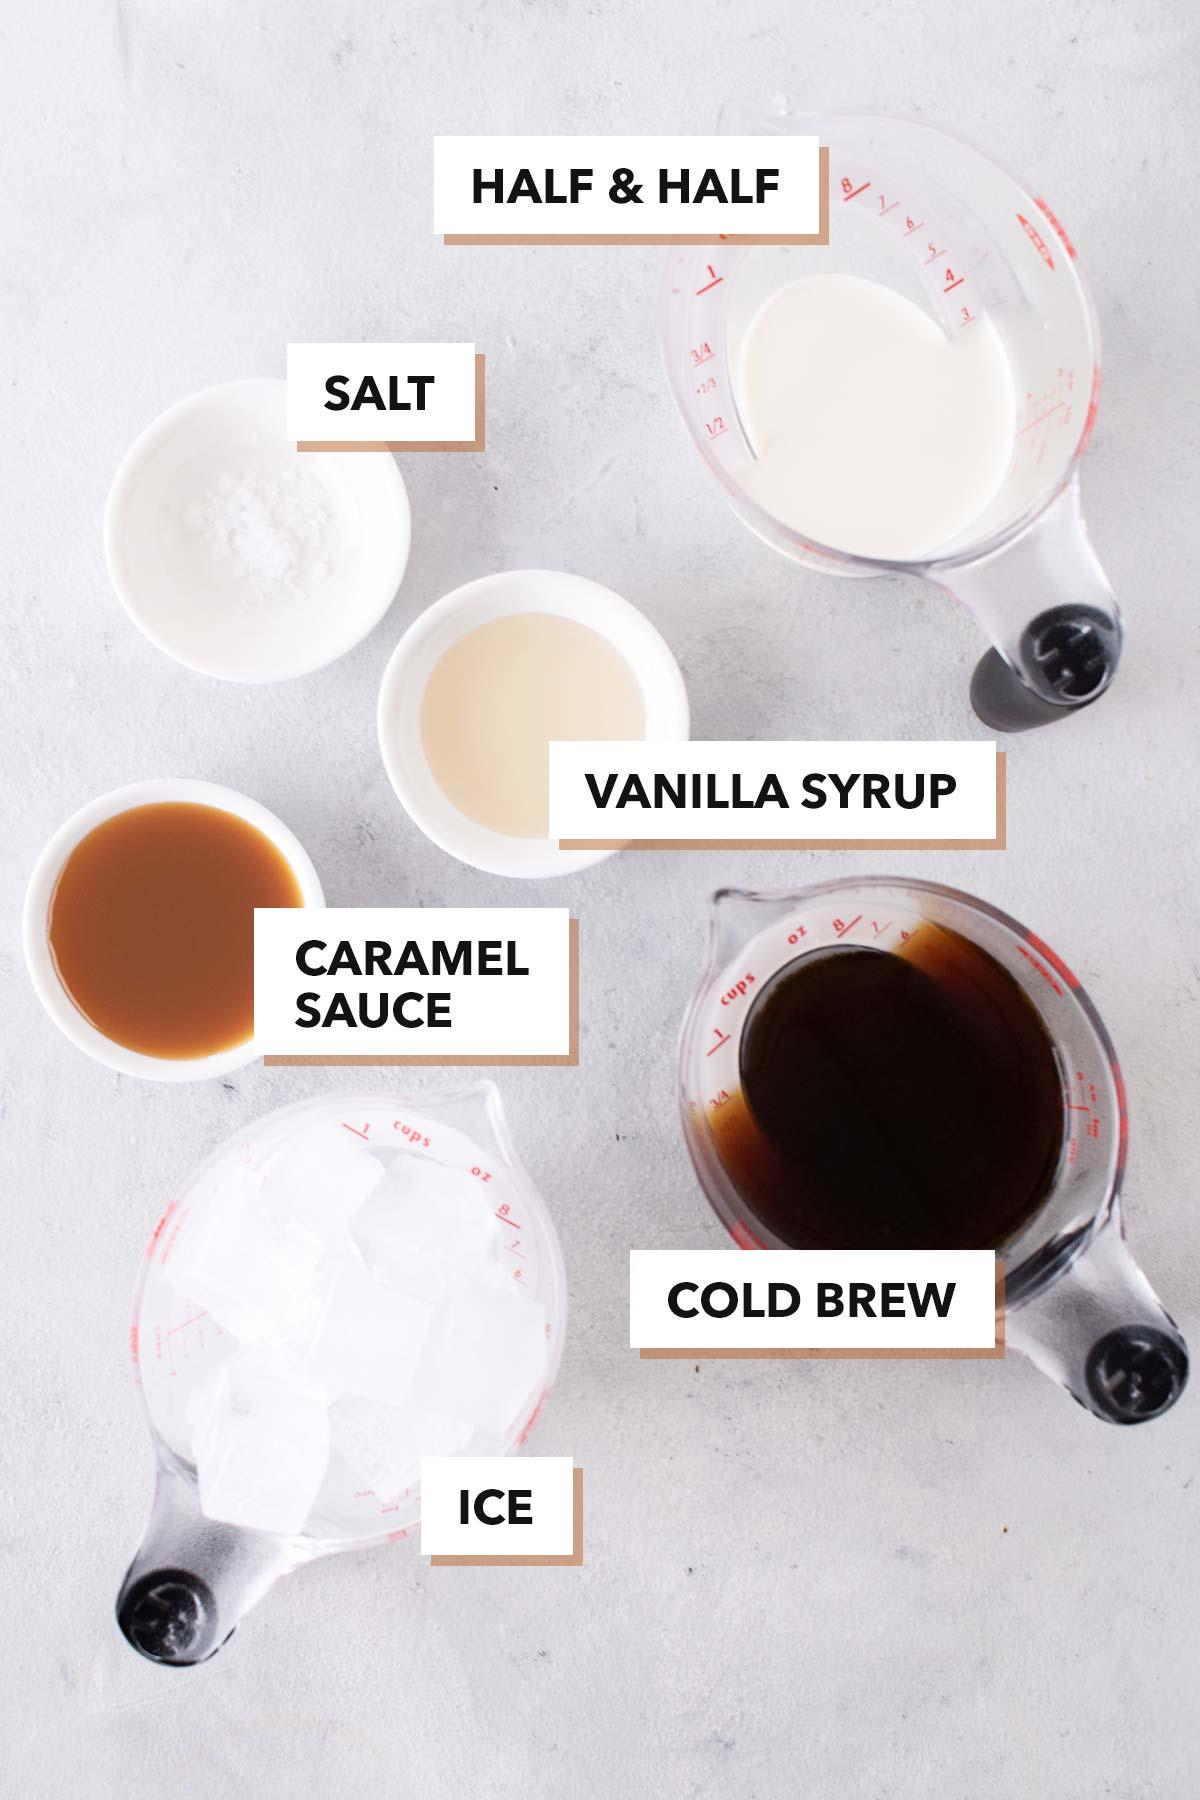 Starbucks Salted Caramel Cream Cold Brew copycat recipe ingredients.